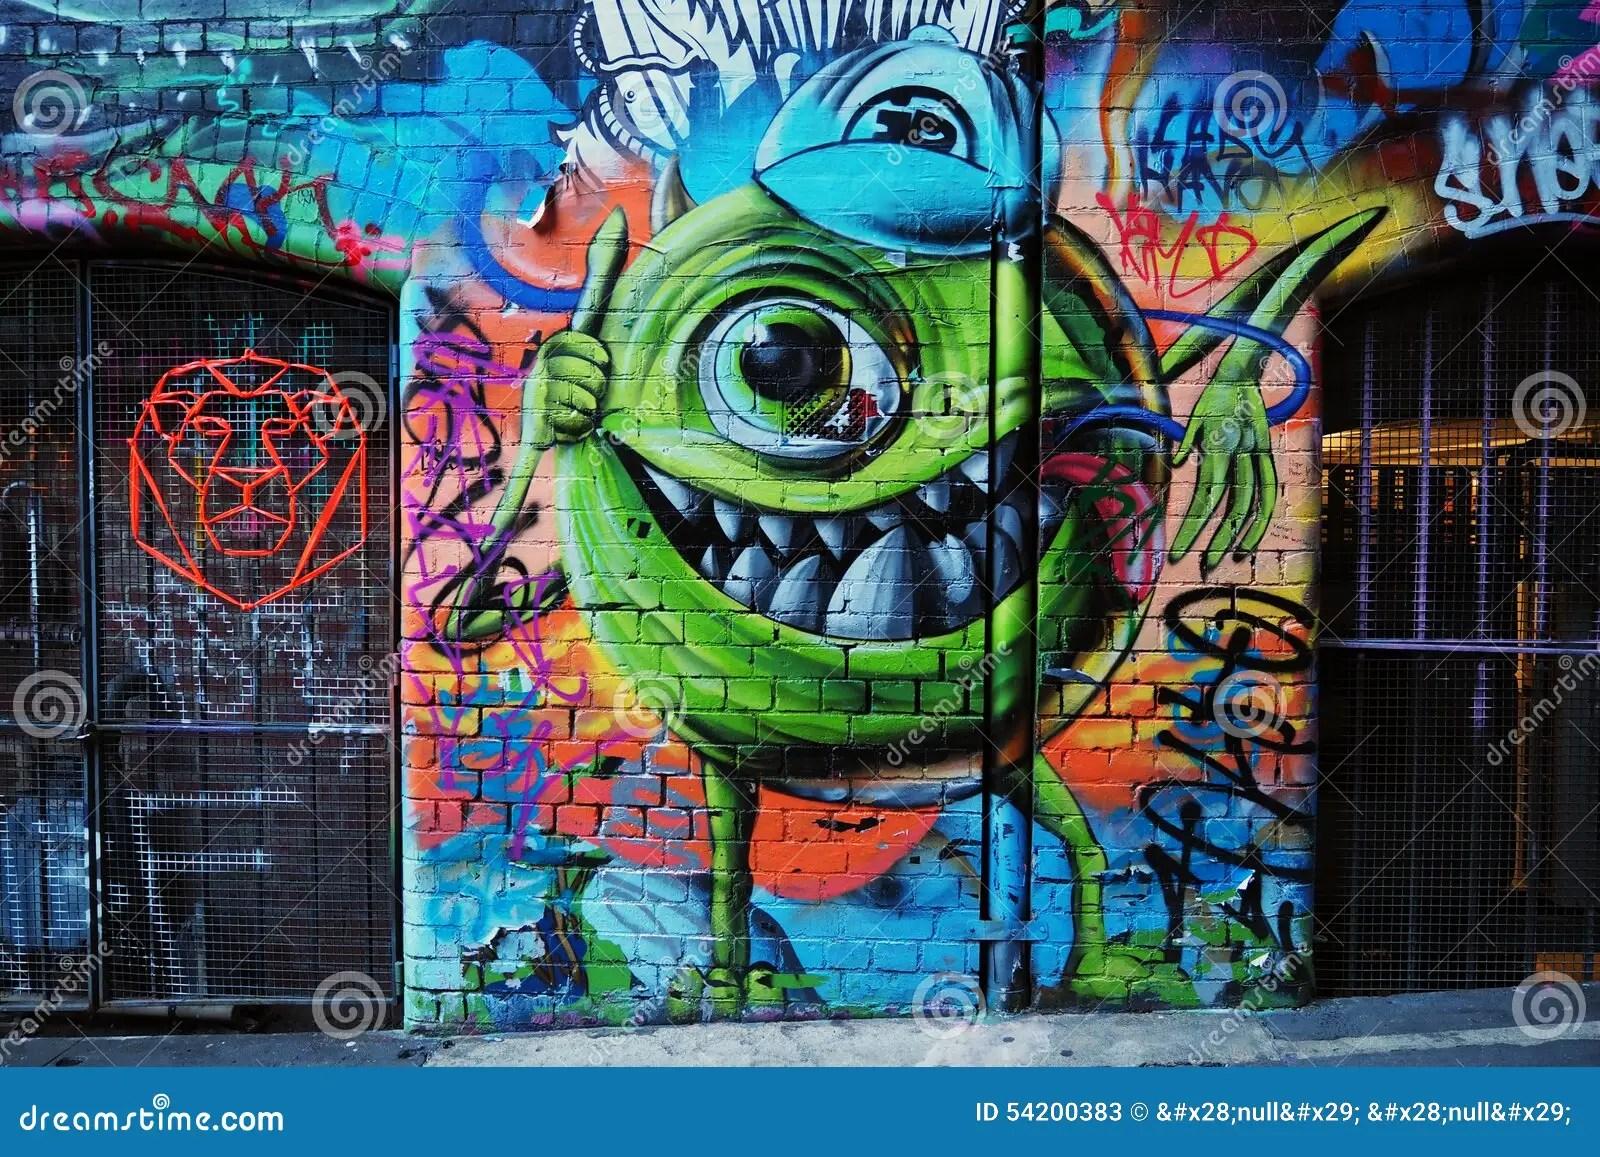 New 3d Animation Wallpaper Graffiti Monster Inc Mike Wazowski Editorial Stock Photo